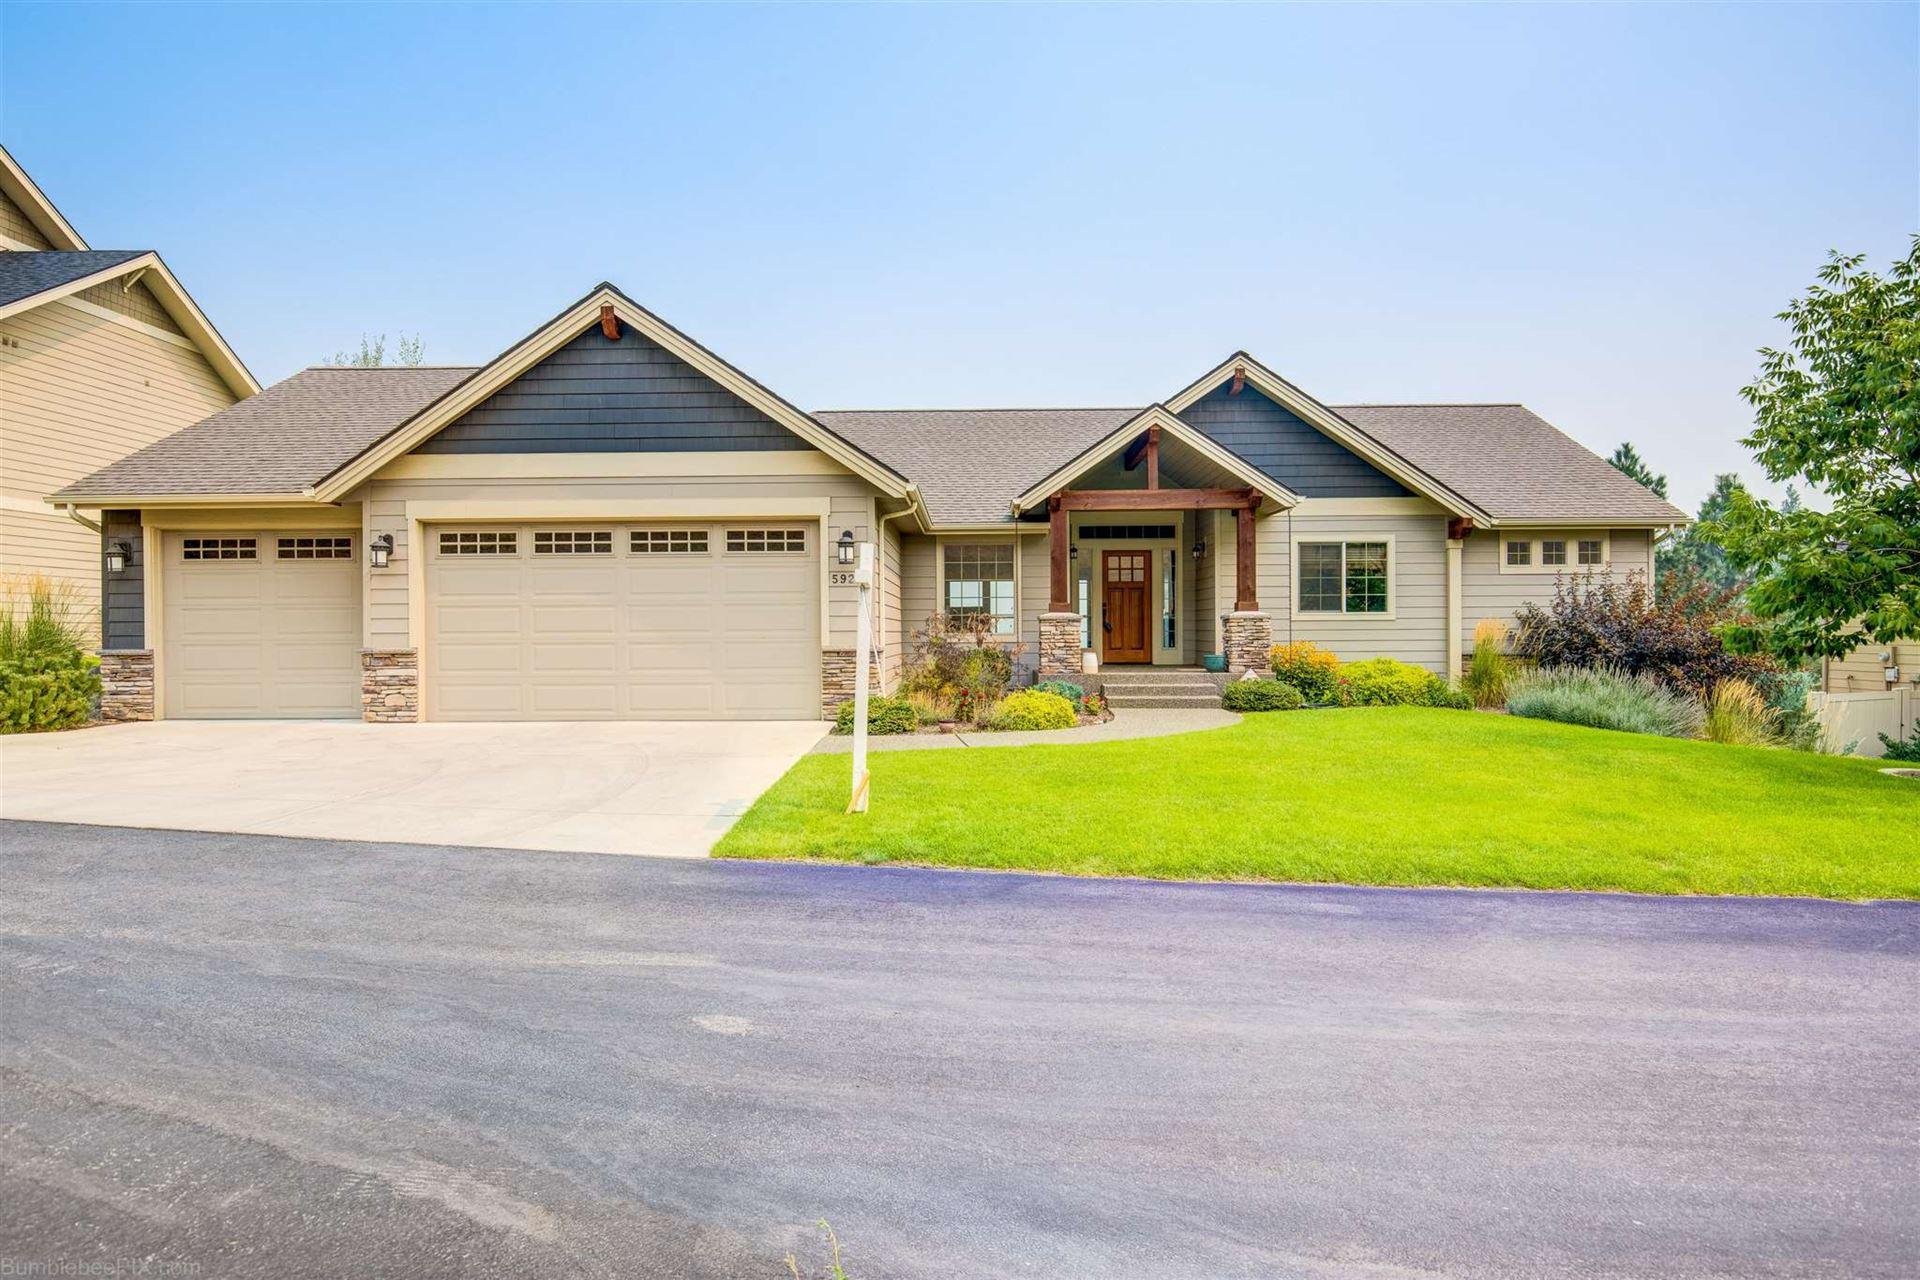 5920 S Summerwood St, Spokane, WA 99224 - #: 202120492